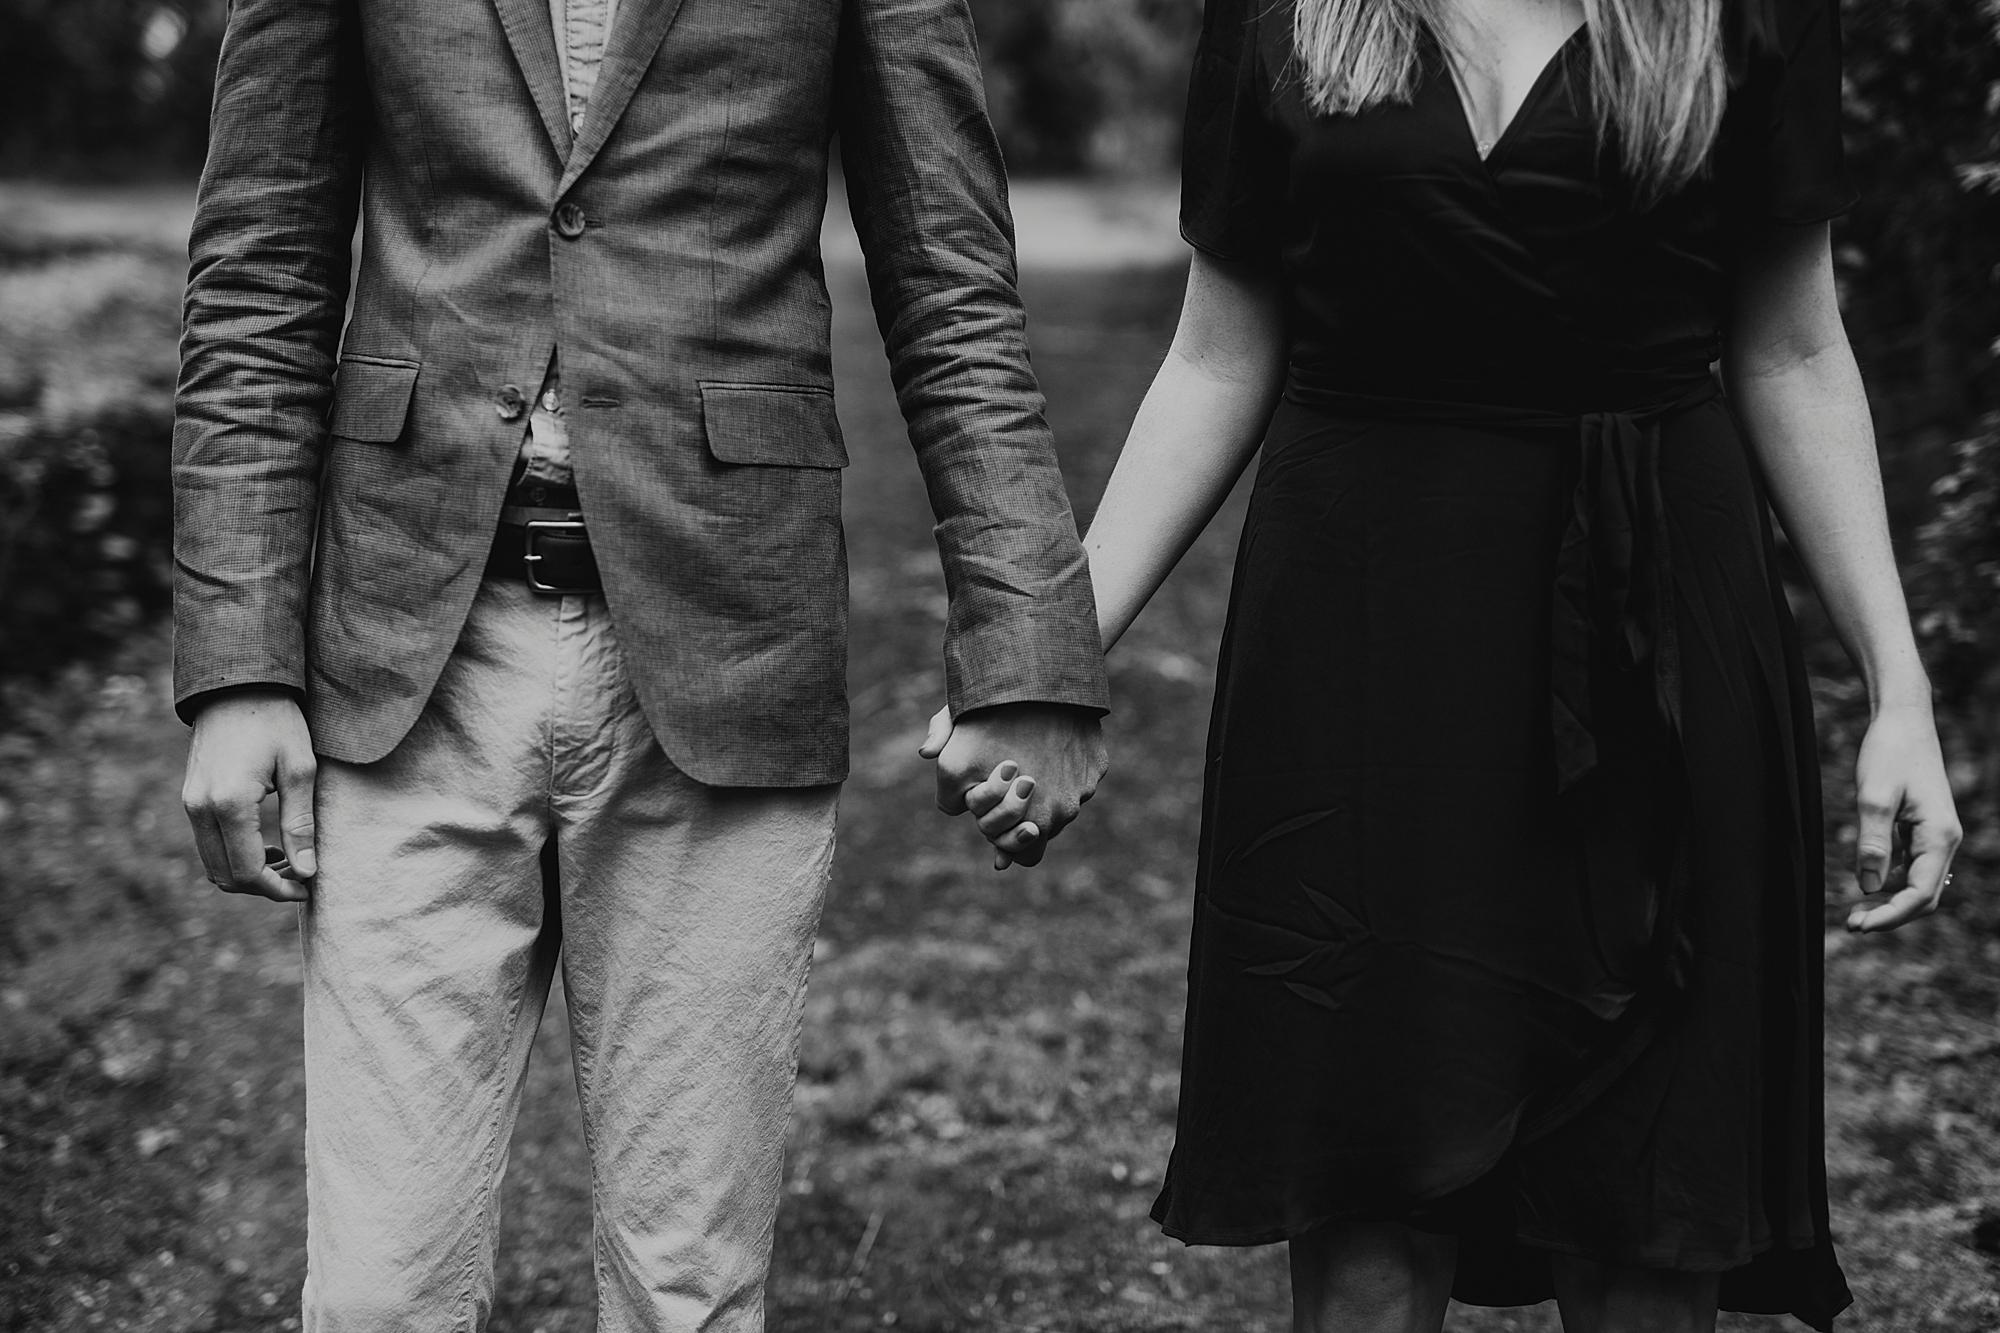 Tori_Zack_Glen_Mills_Terrain Cafe_Wedding_Engagement_Photography_Joe_Mac_Creative__0029.jpg